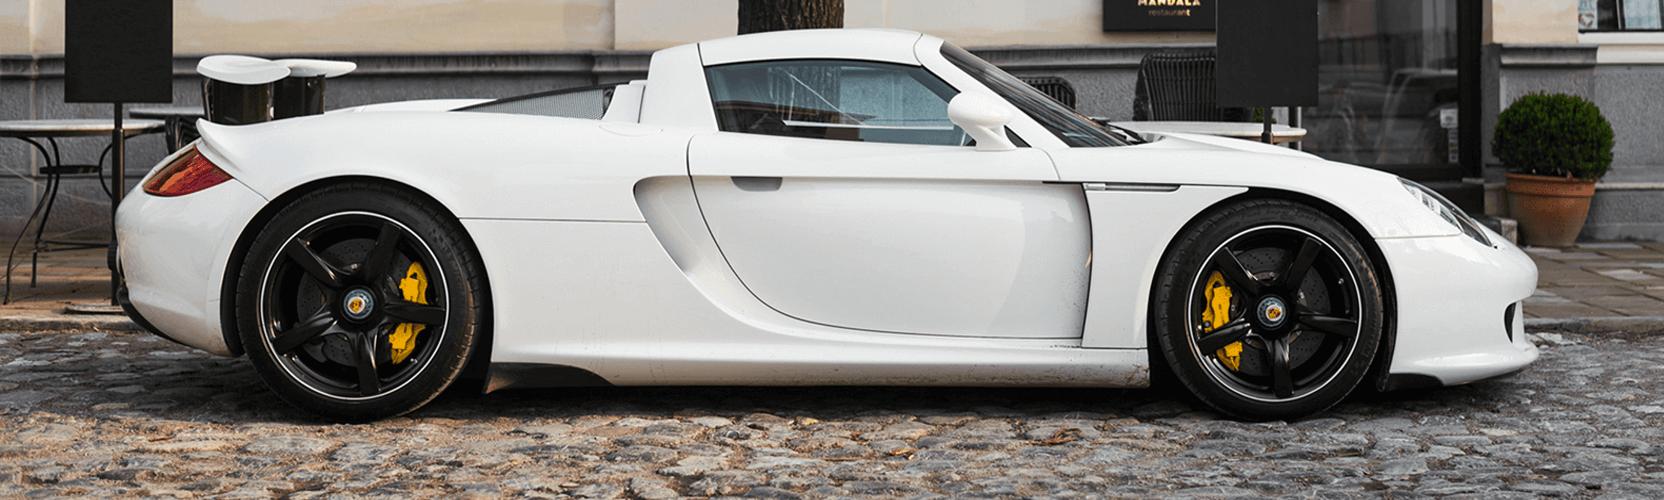 White Porsche Carrera GT